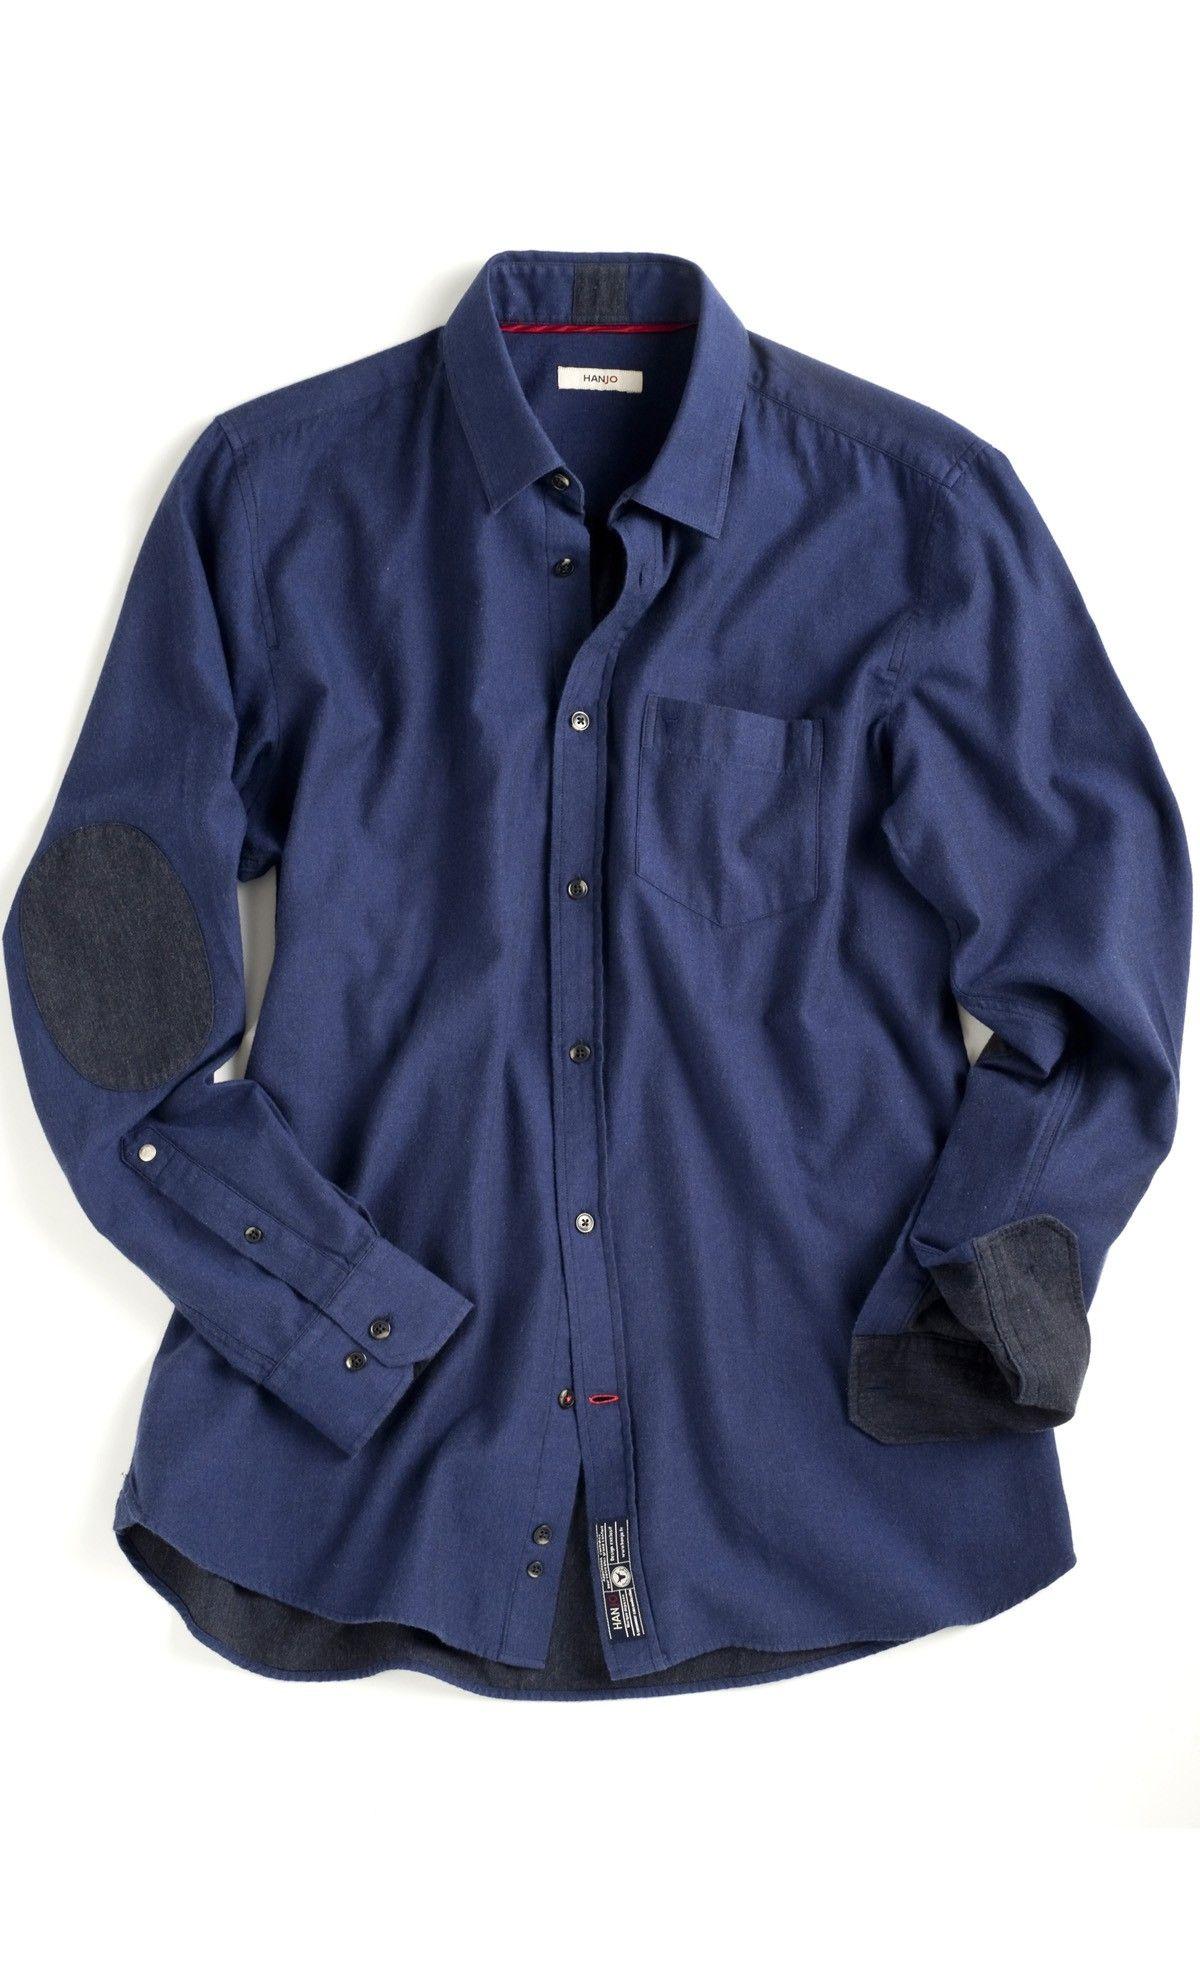 tenue homme classe soir e fete style moderne habill chemise flanelle bleue homme syle. Black Bedroom Furniture Sets. Home Design Ideas